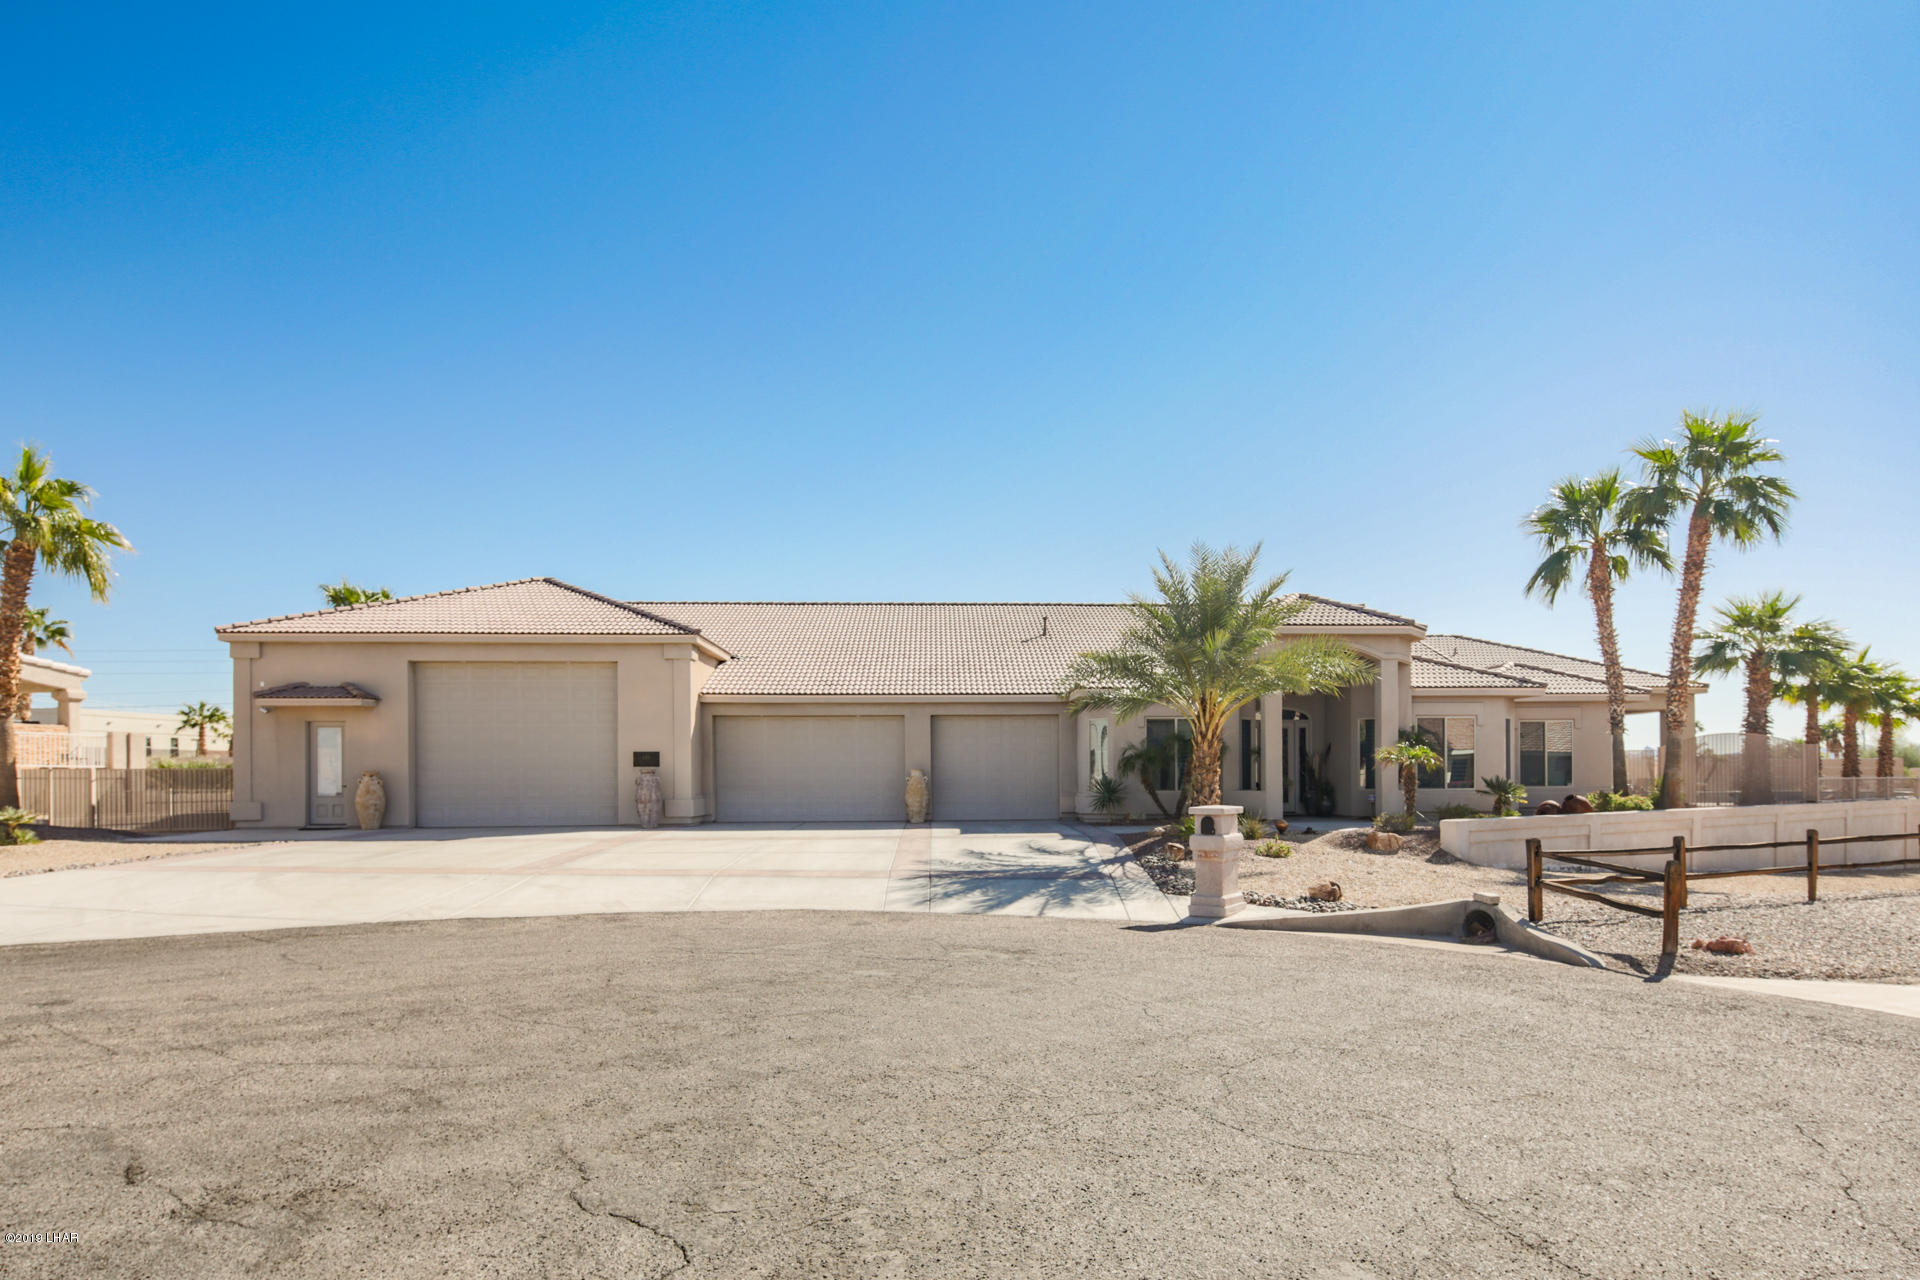 Photo of 659 Plaza Laredo, Lake Havasu City, AZ 86406